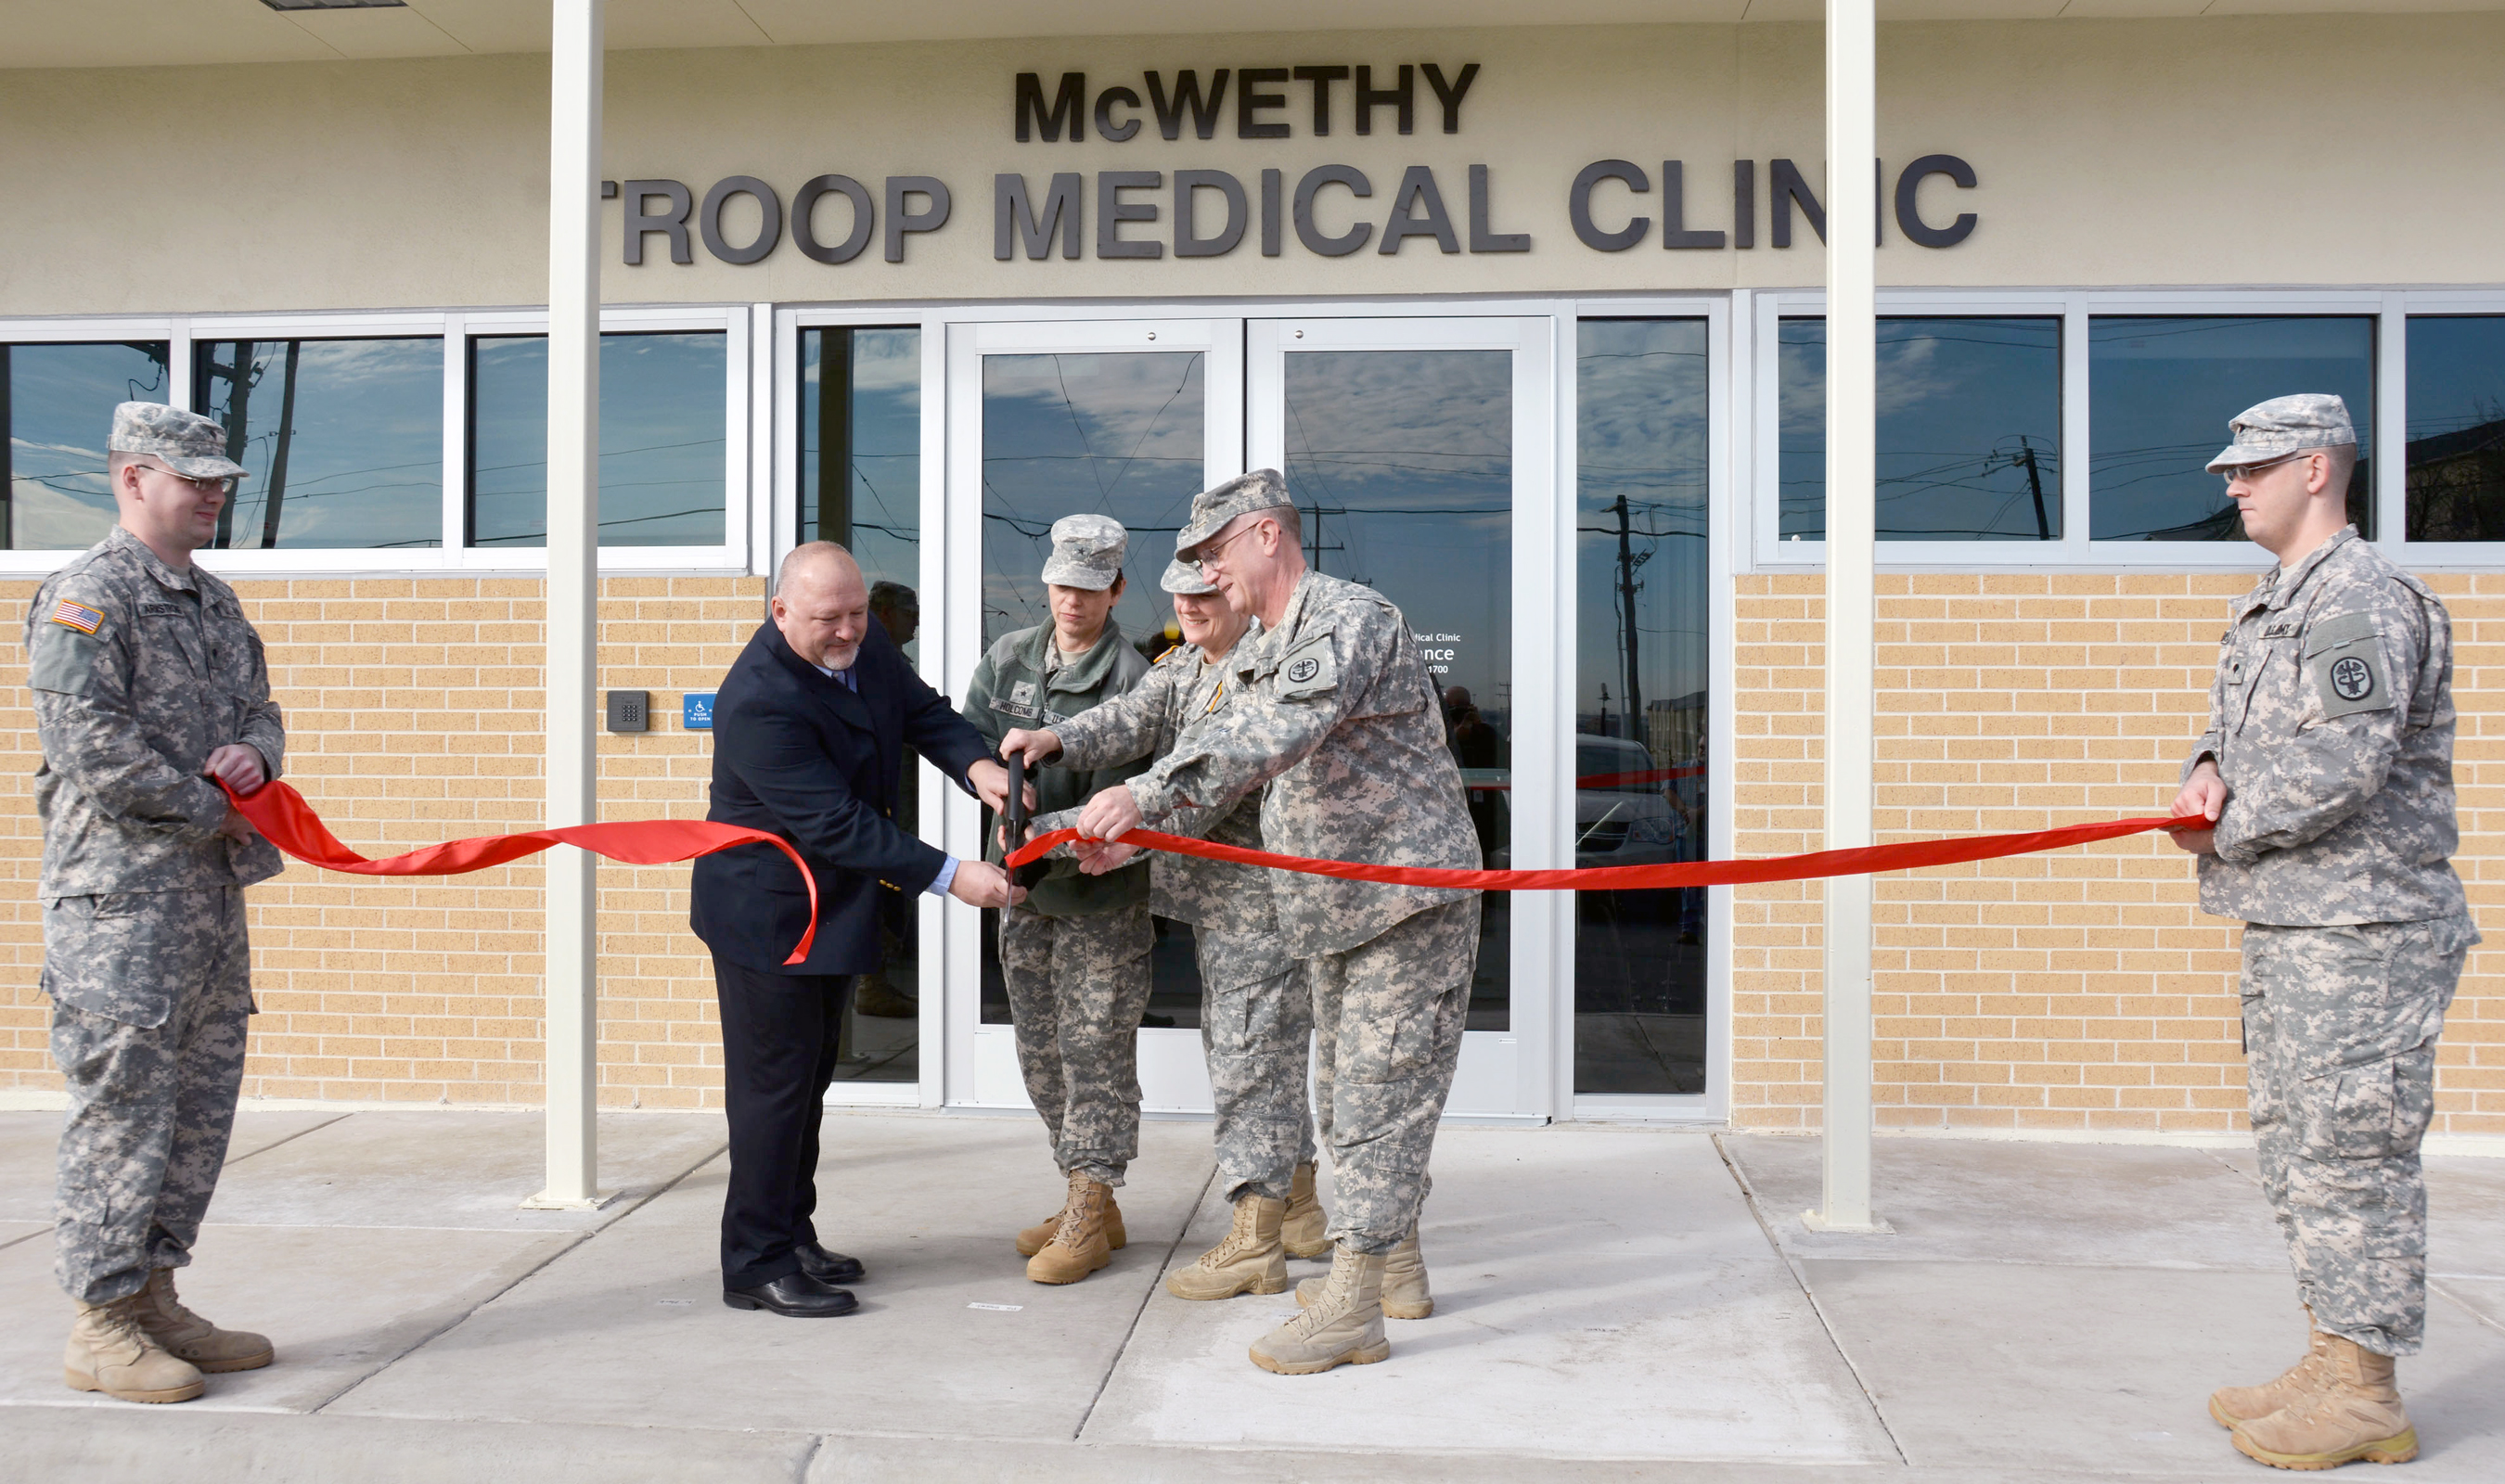 Medical Clinics St. Louis